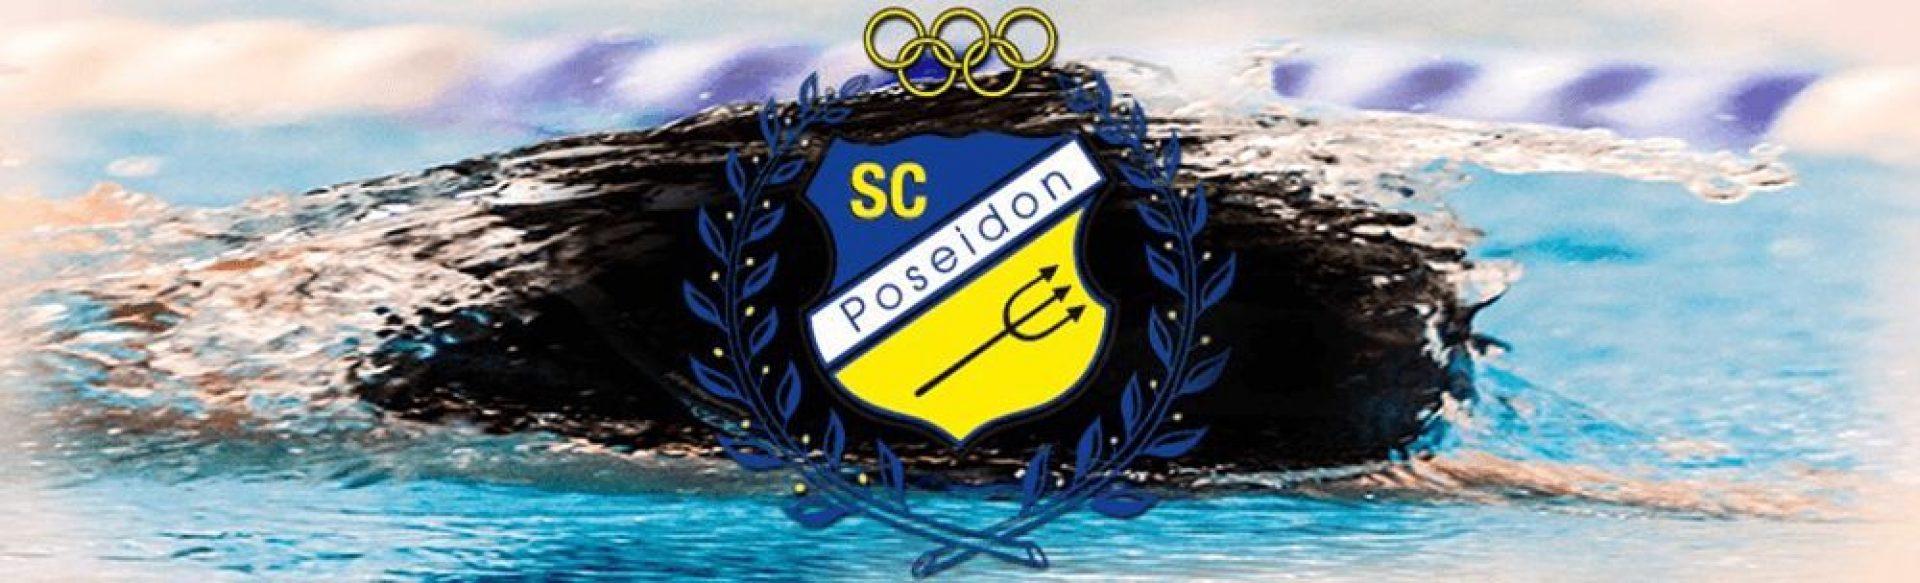 SC Poseidon Berlin e.V.